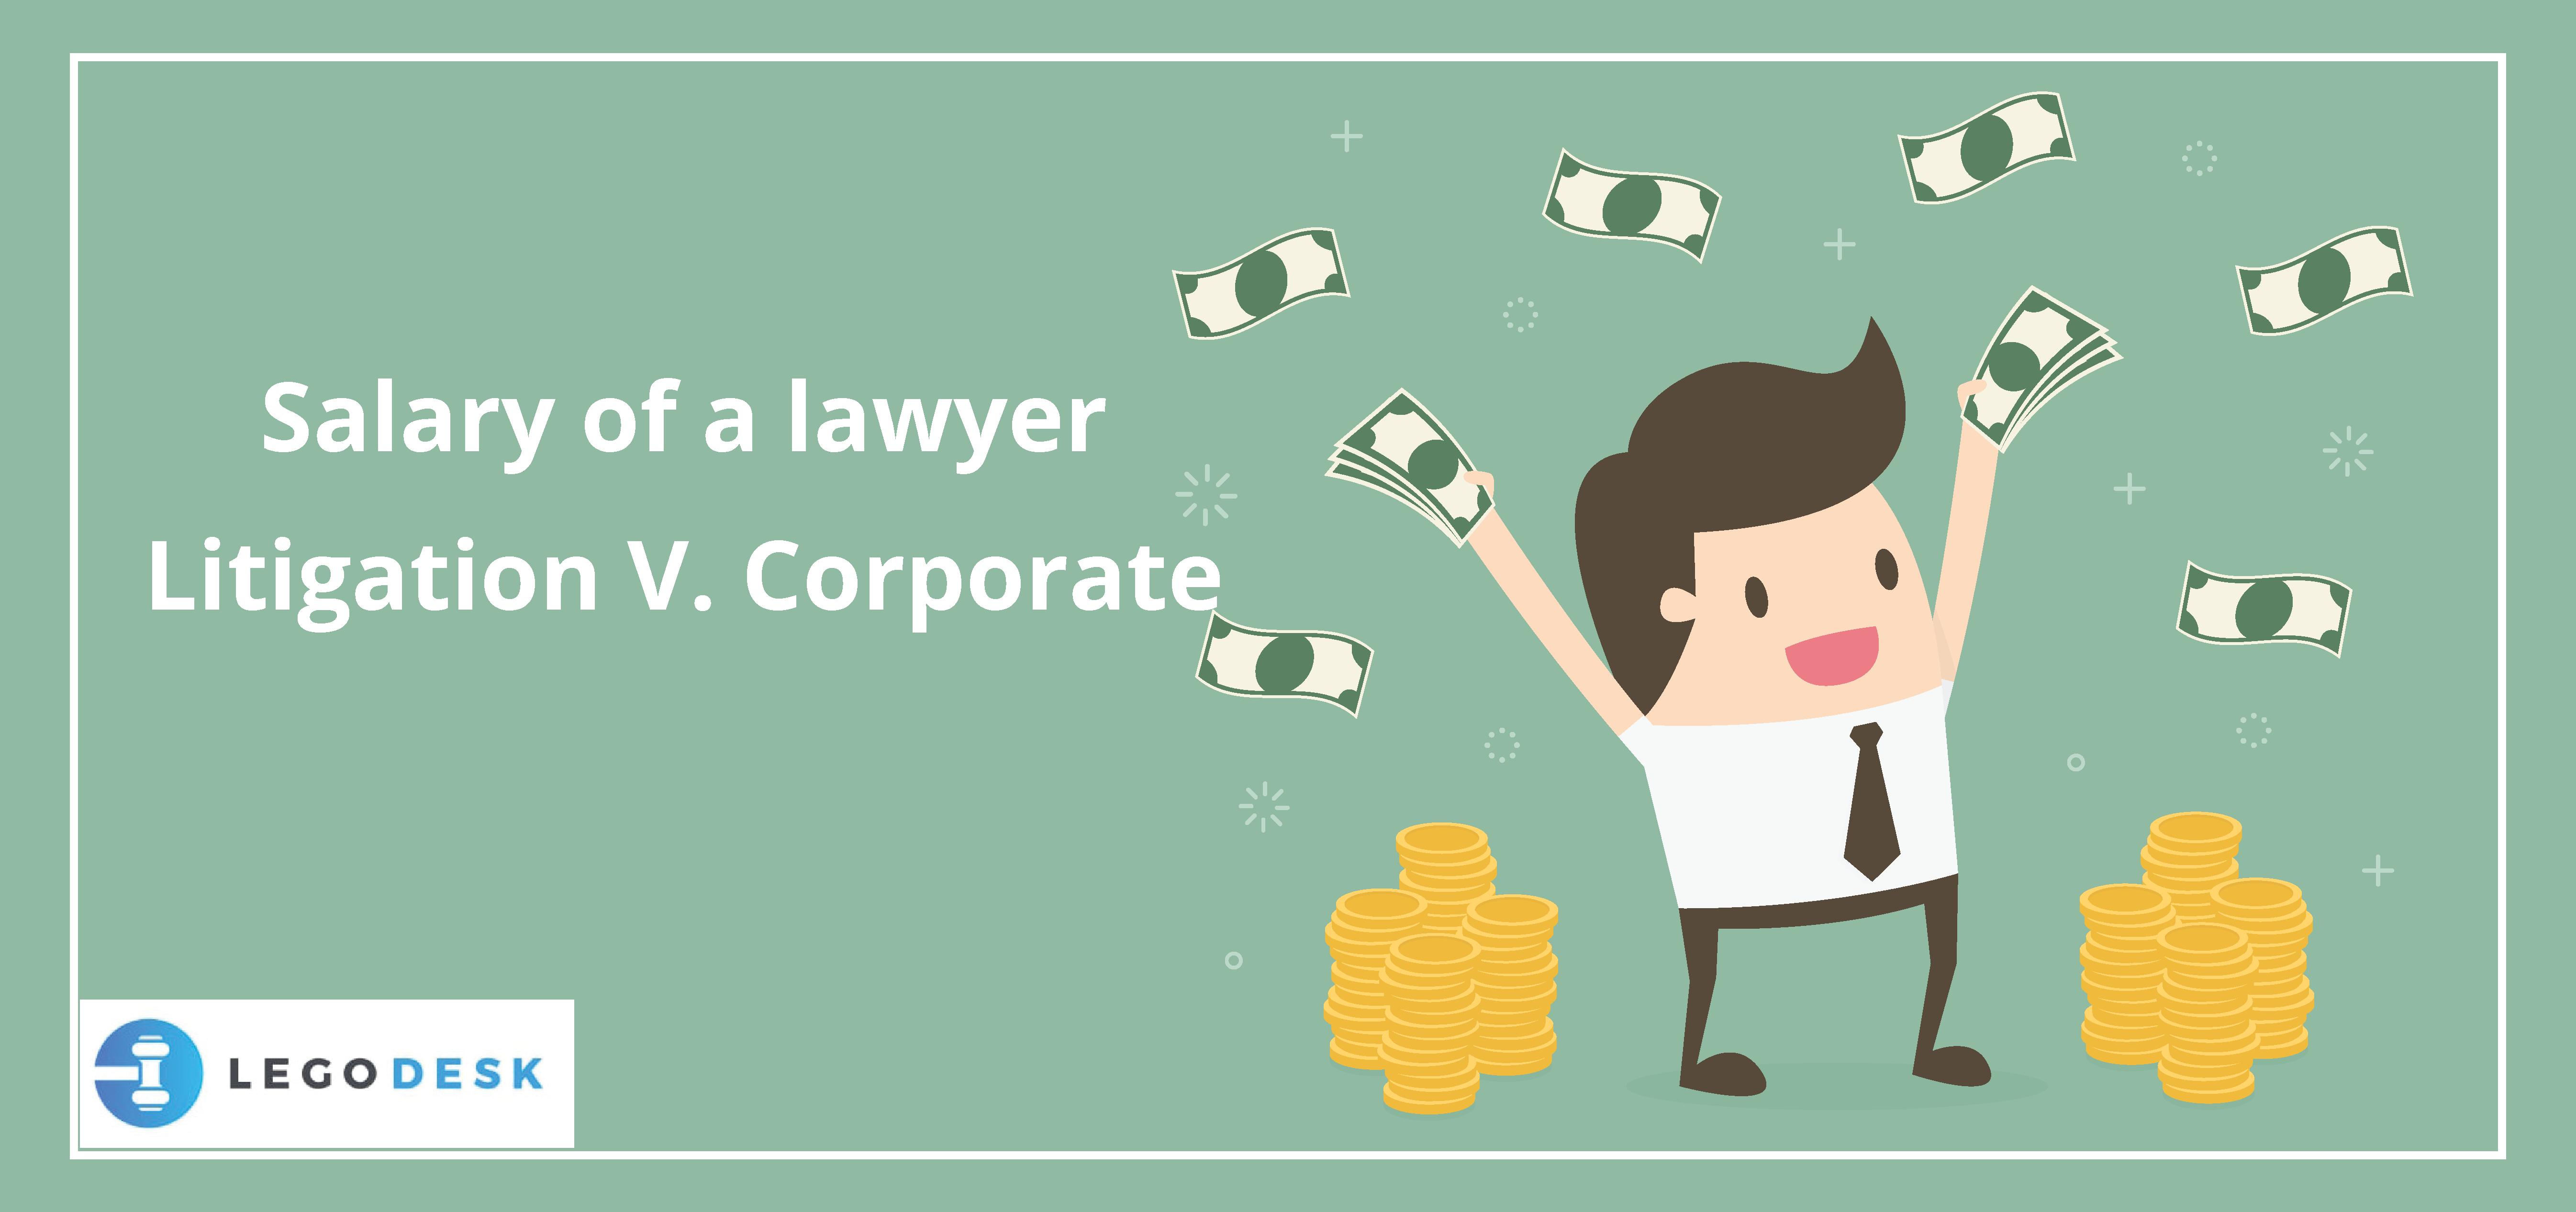 Salary of a lawyer : Litigation V. Corporate